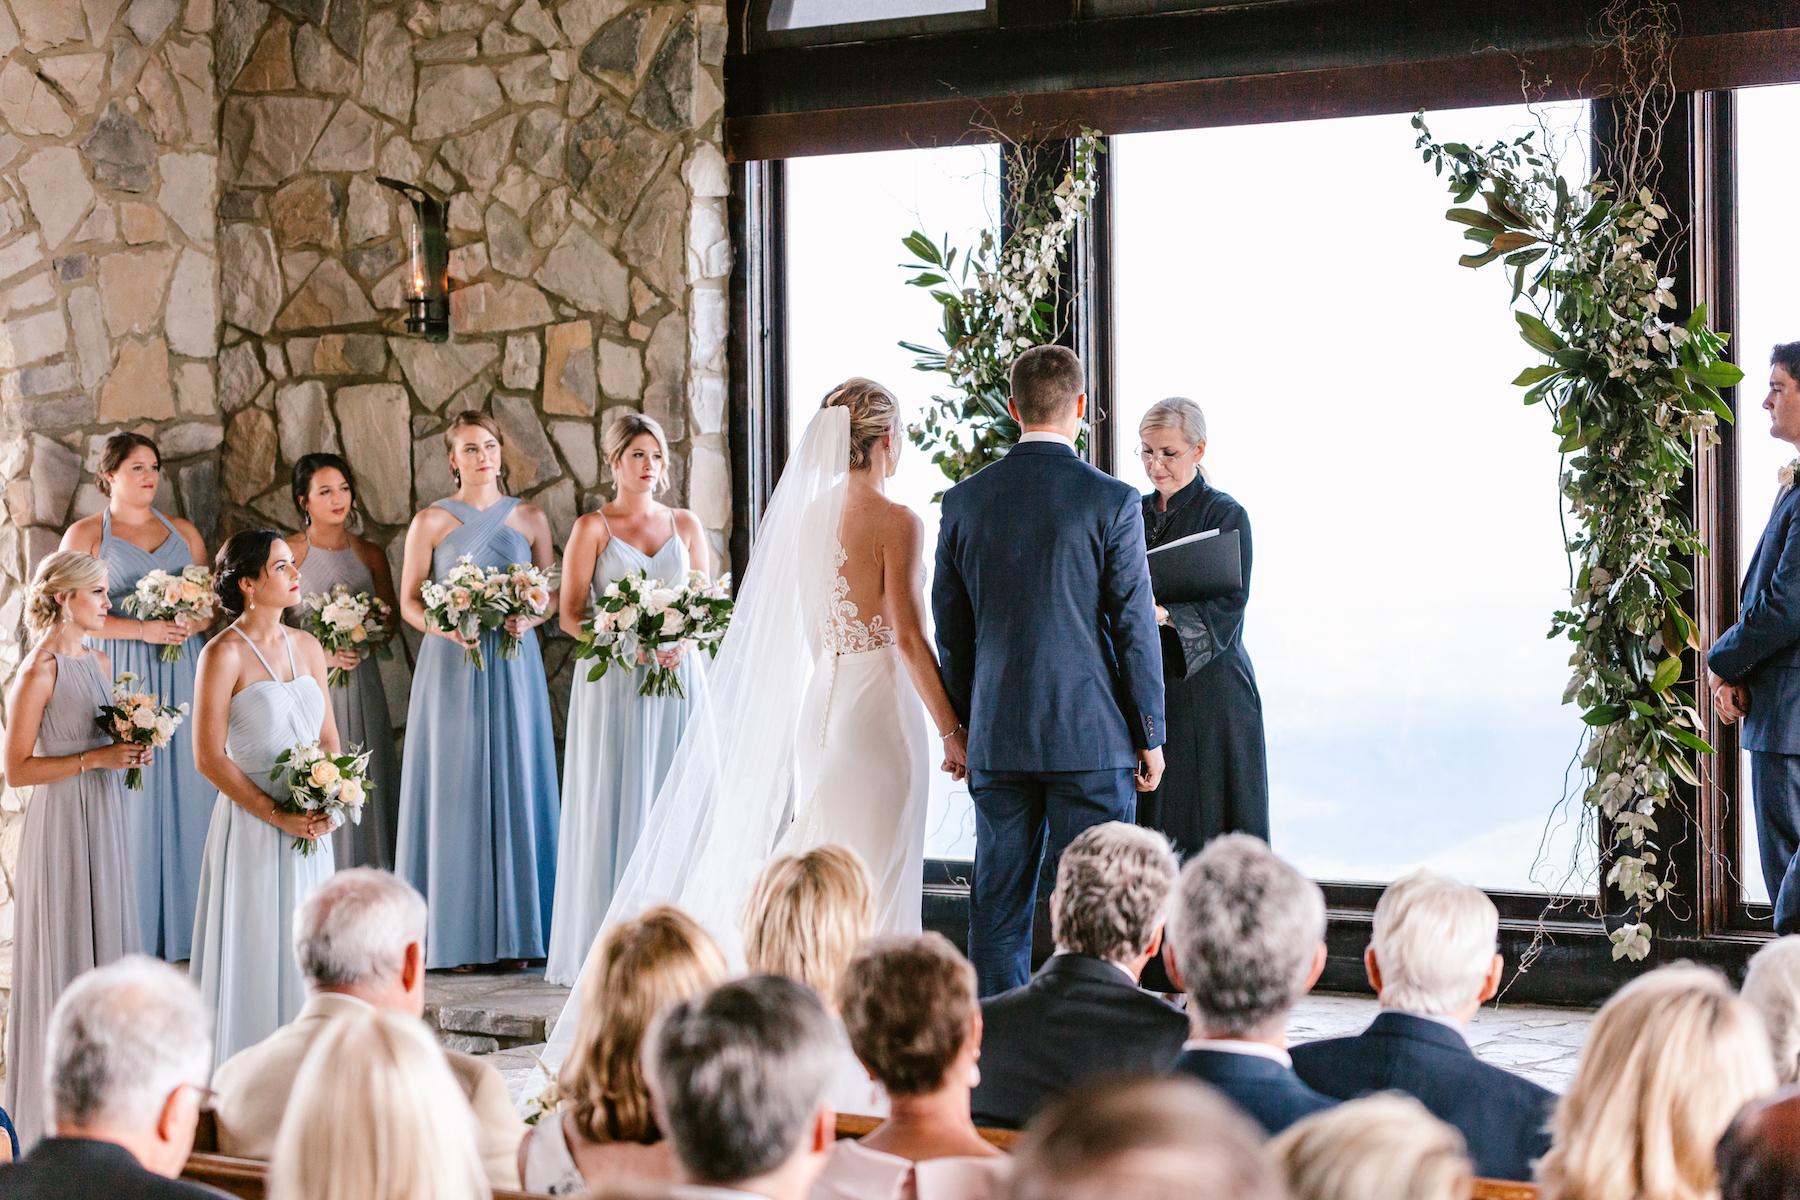 wedding-engagement-photographer-spartanburg-greenville-columbia-carolina-south-north-491.JPG